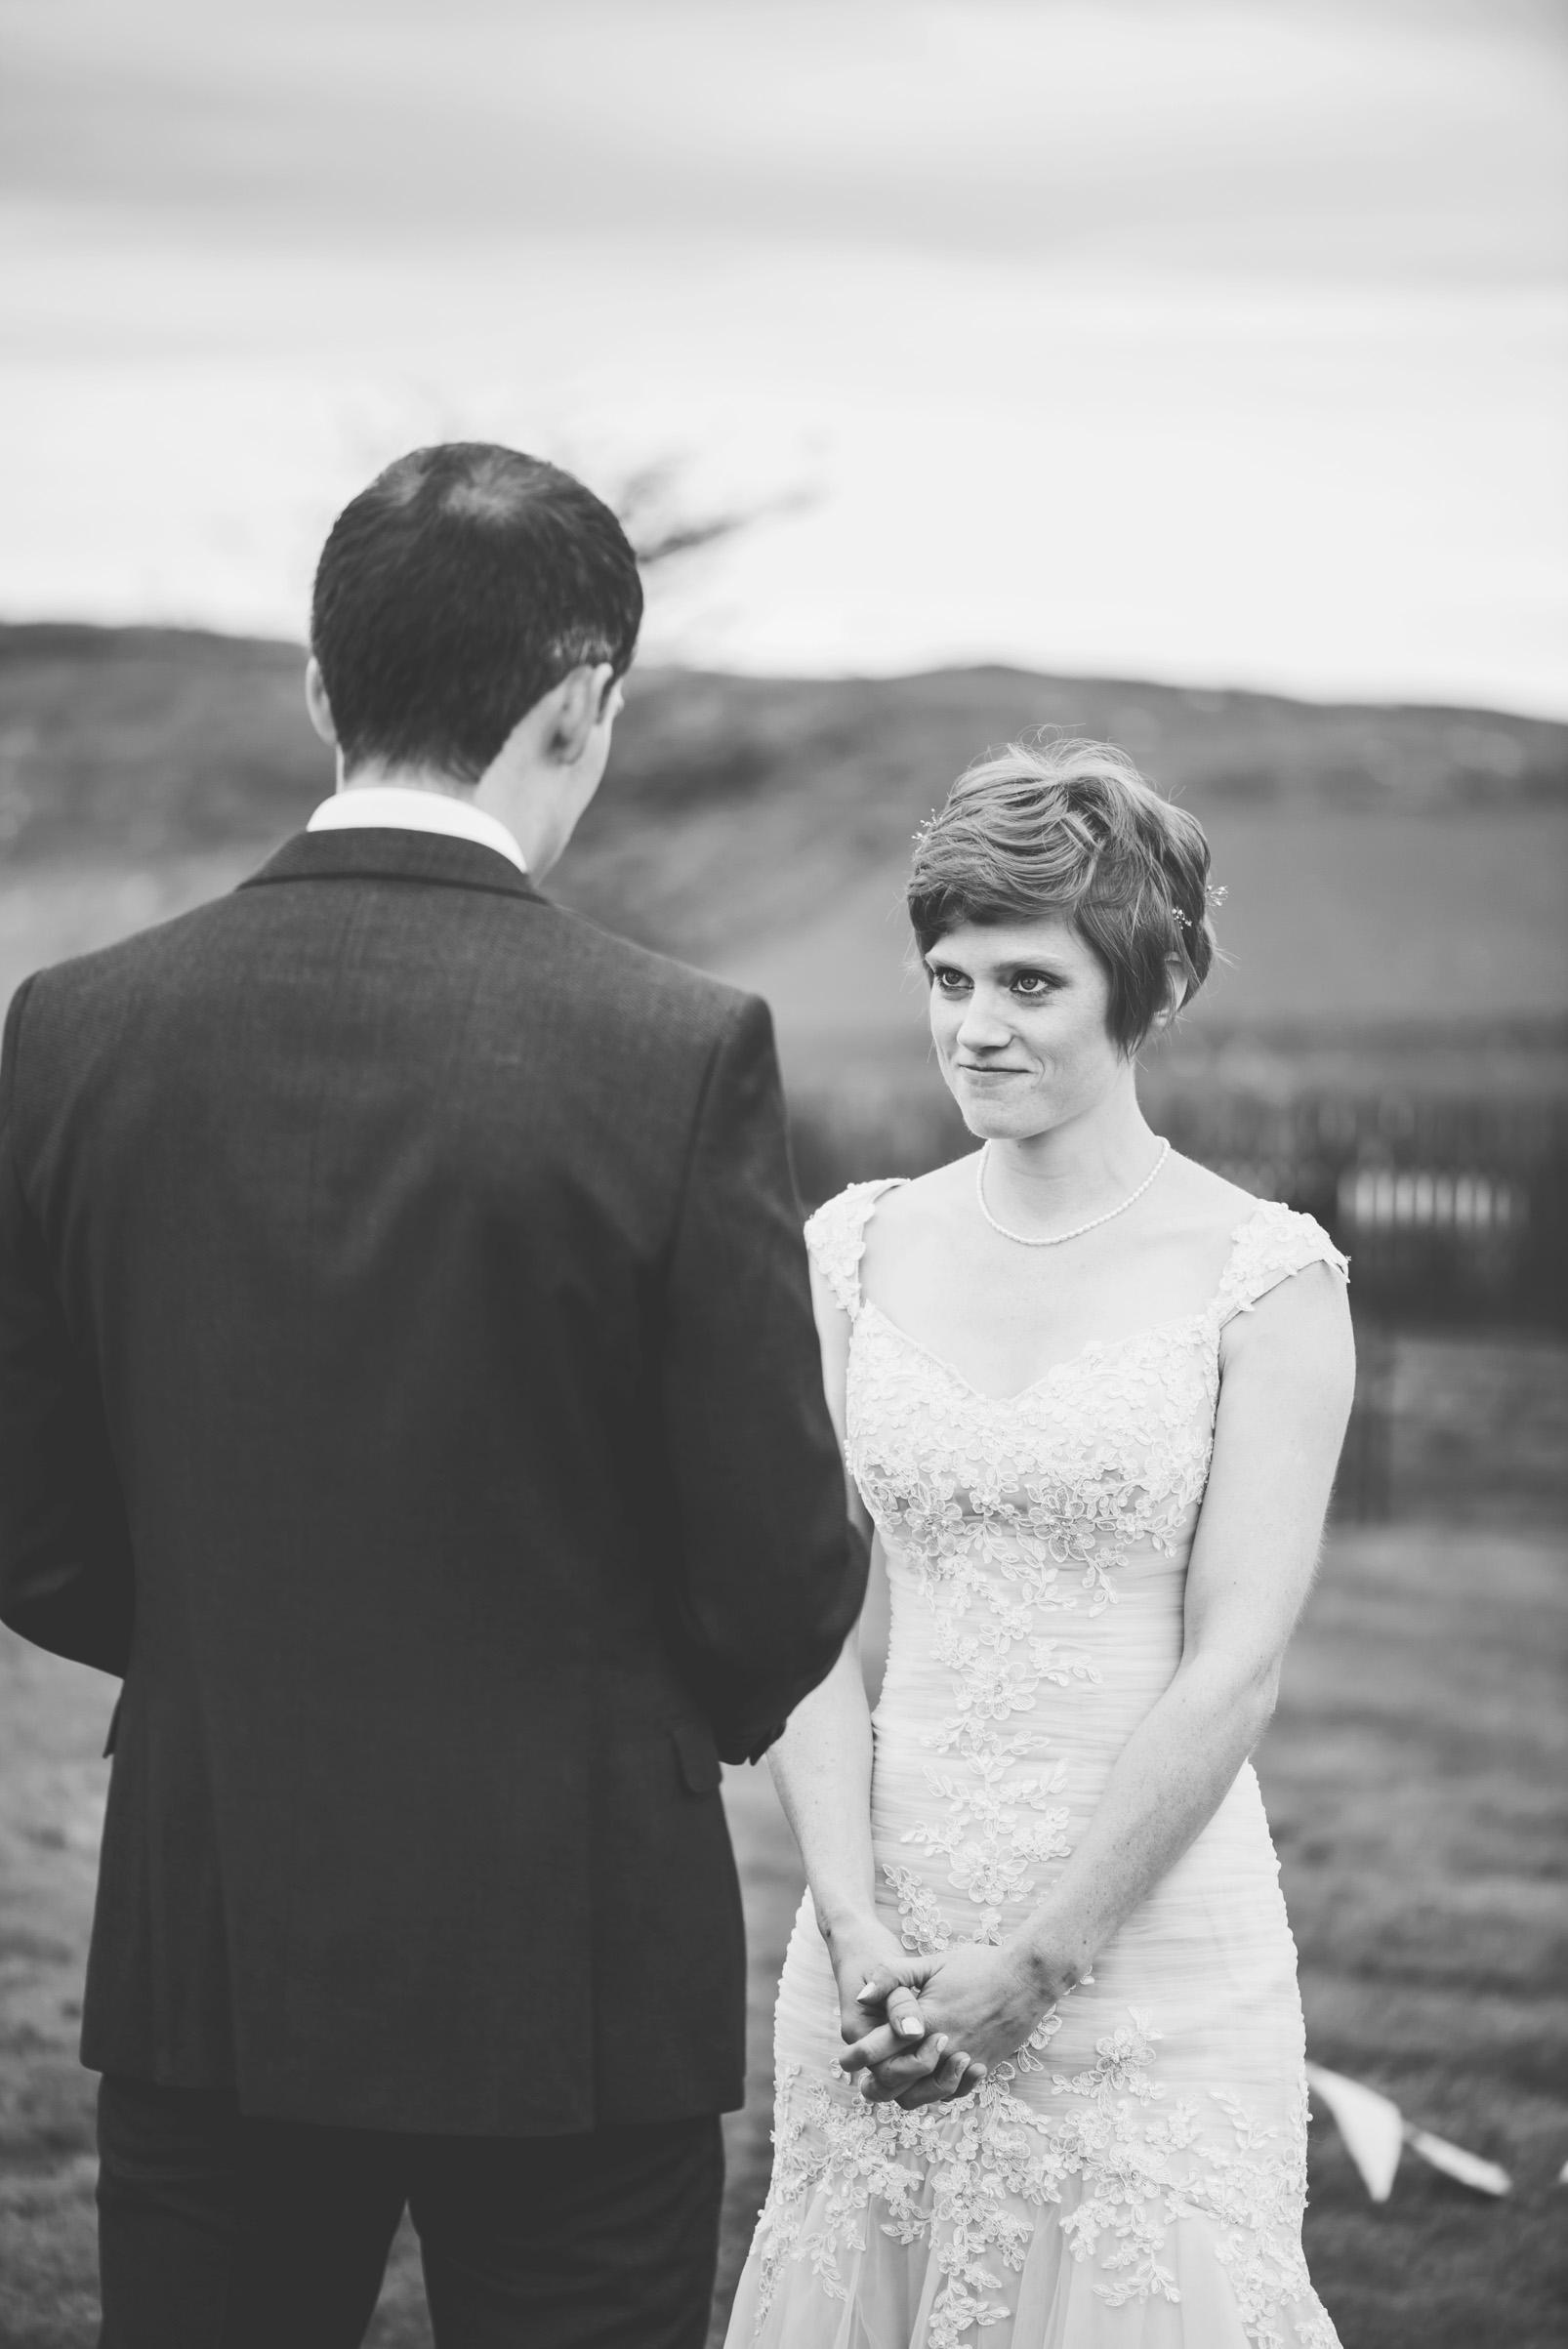 Peak+district+farm+wedding+lower+damgate+photographer-137.jpg